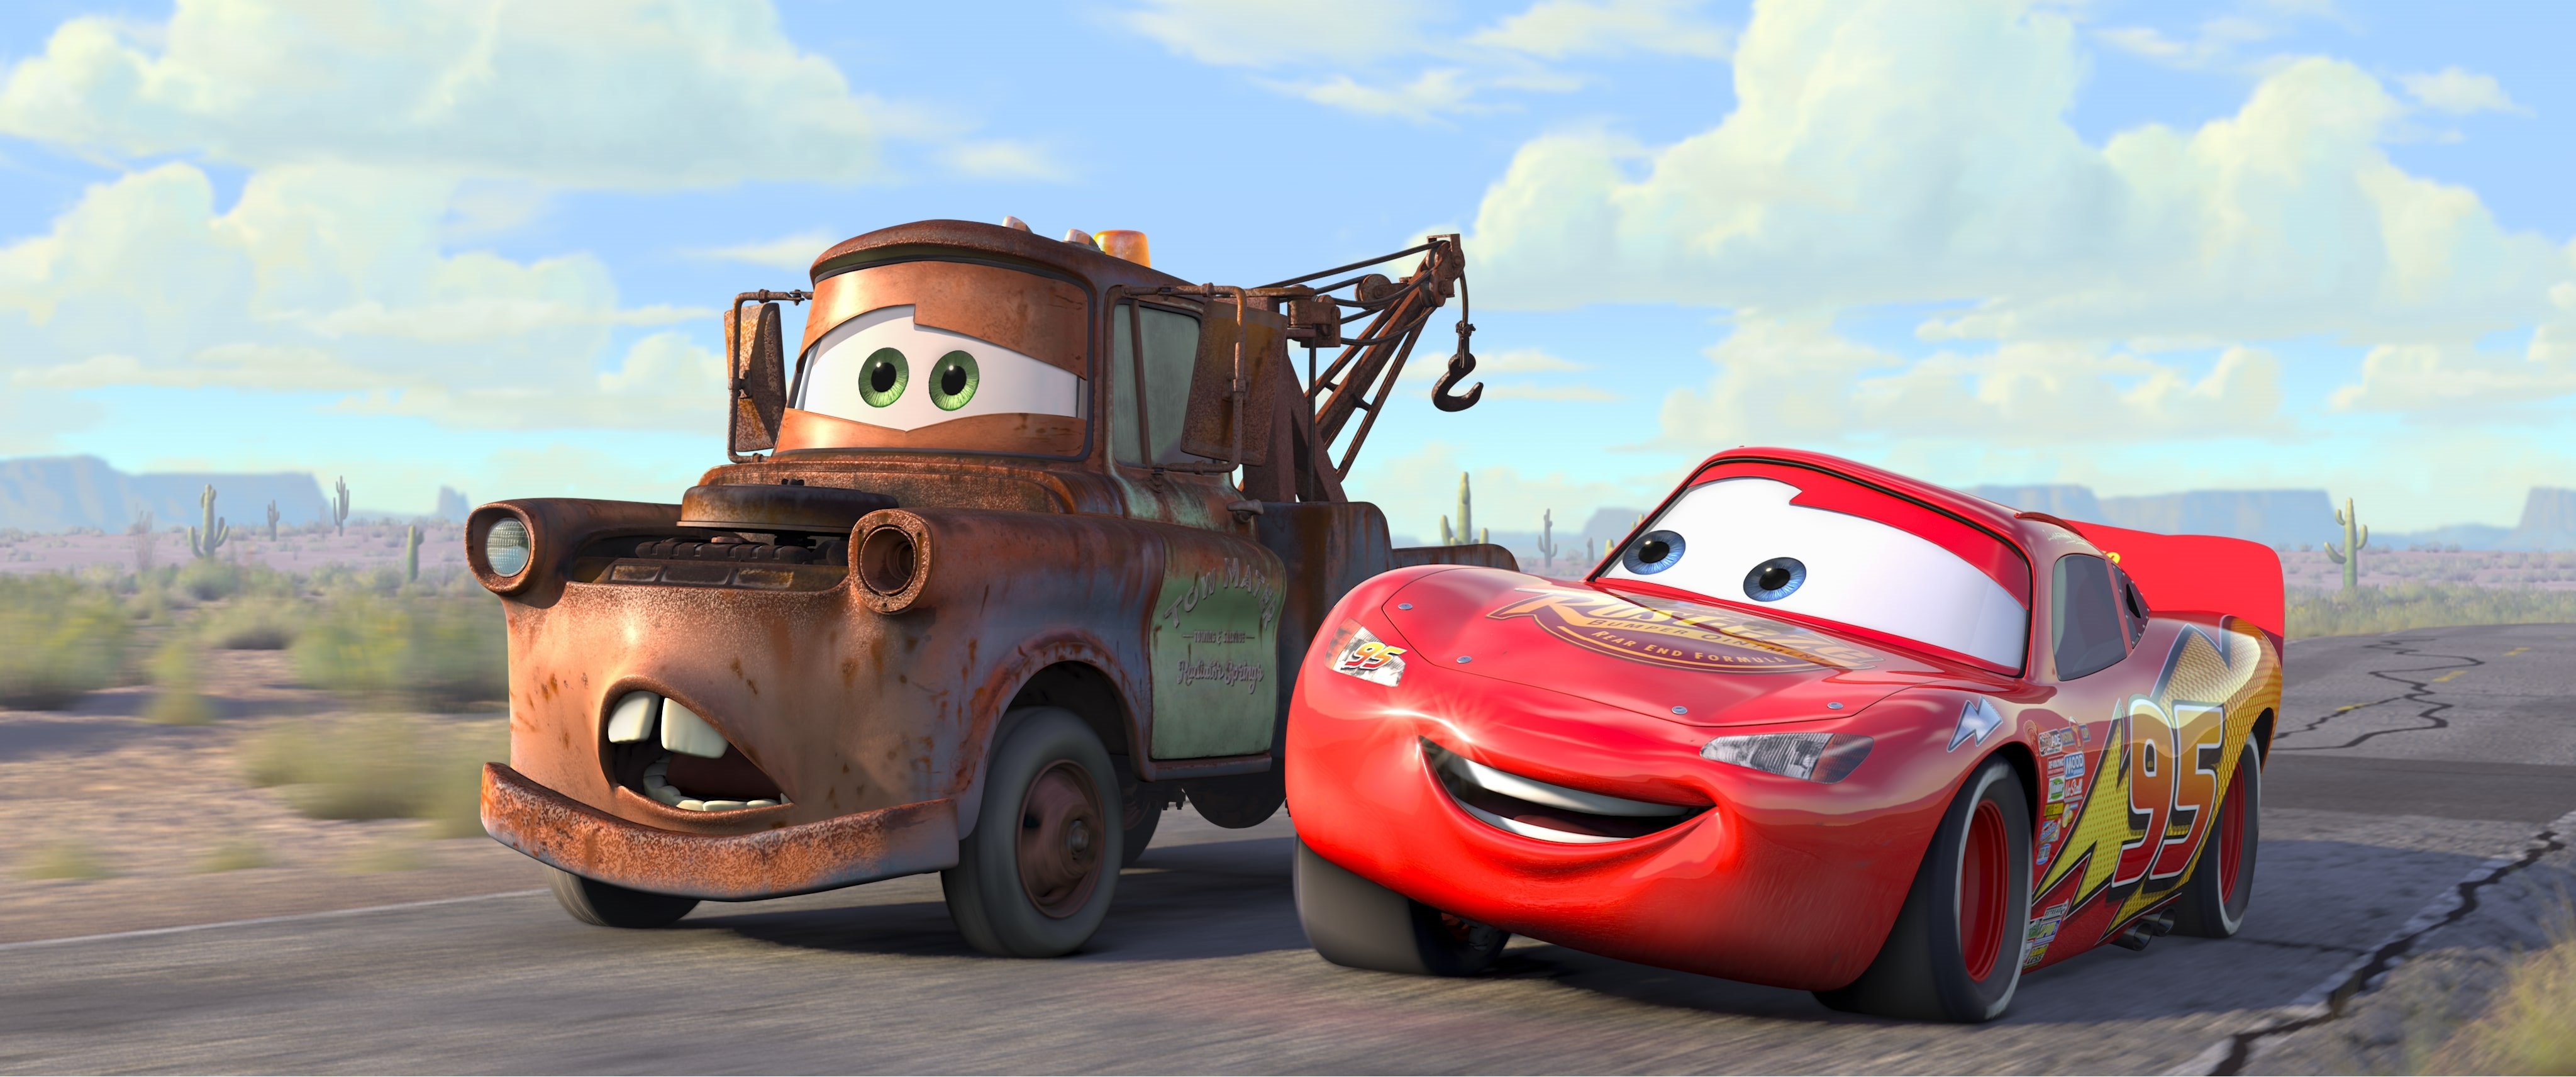 Disney Pixar S Cars Movie On Route 66 Route Magazine